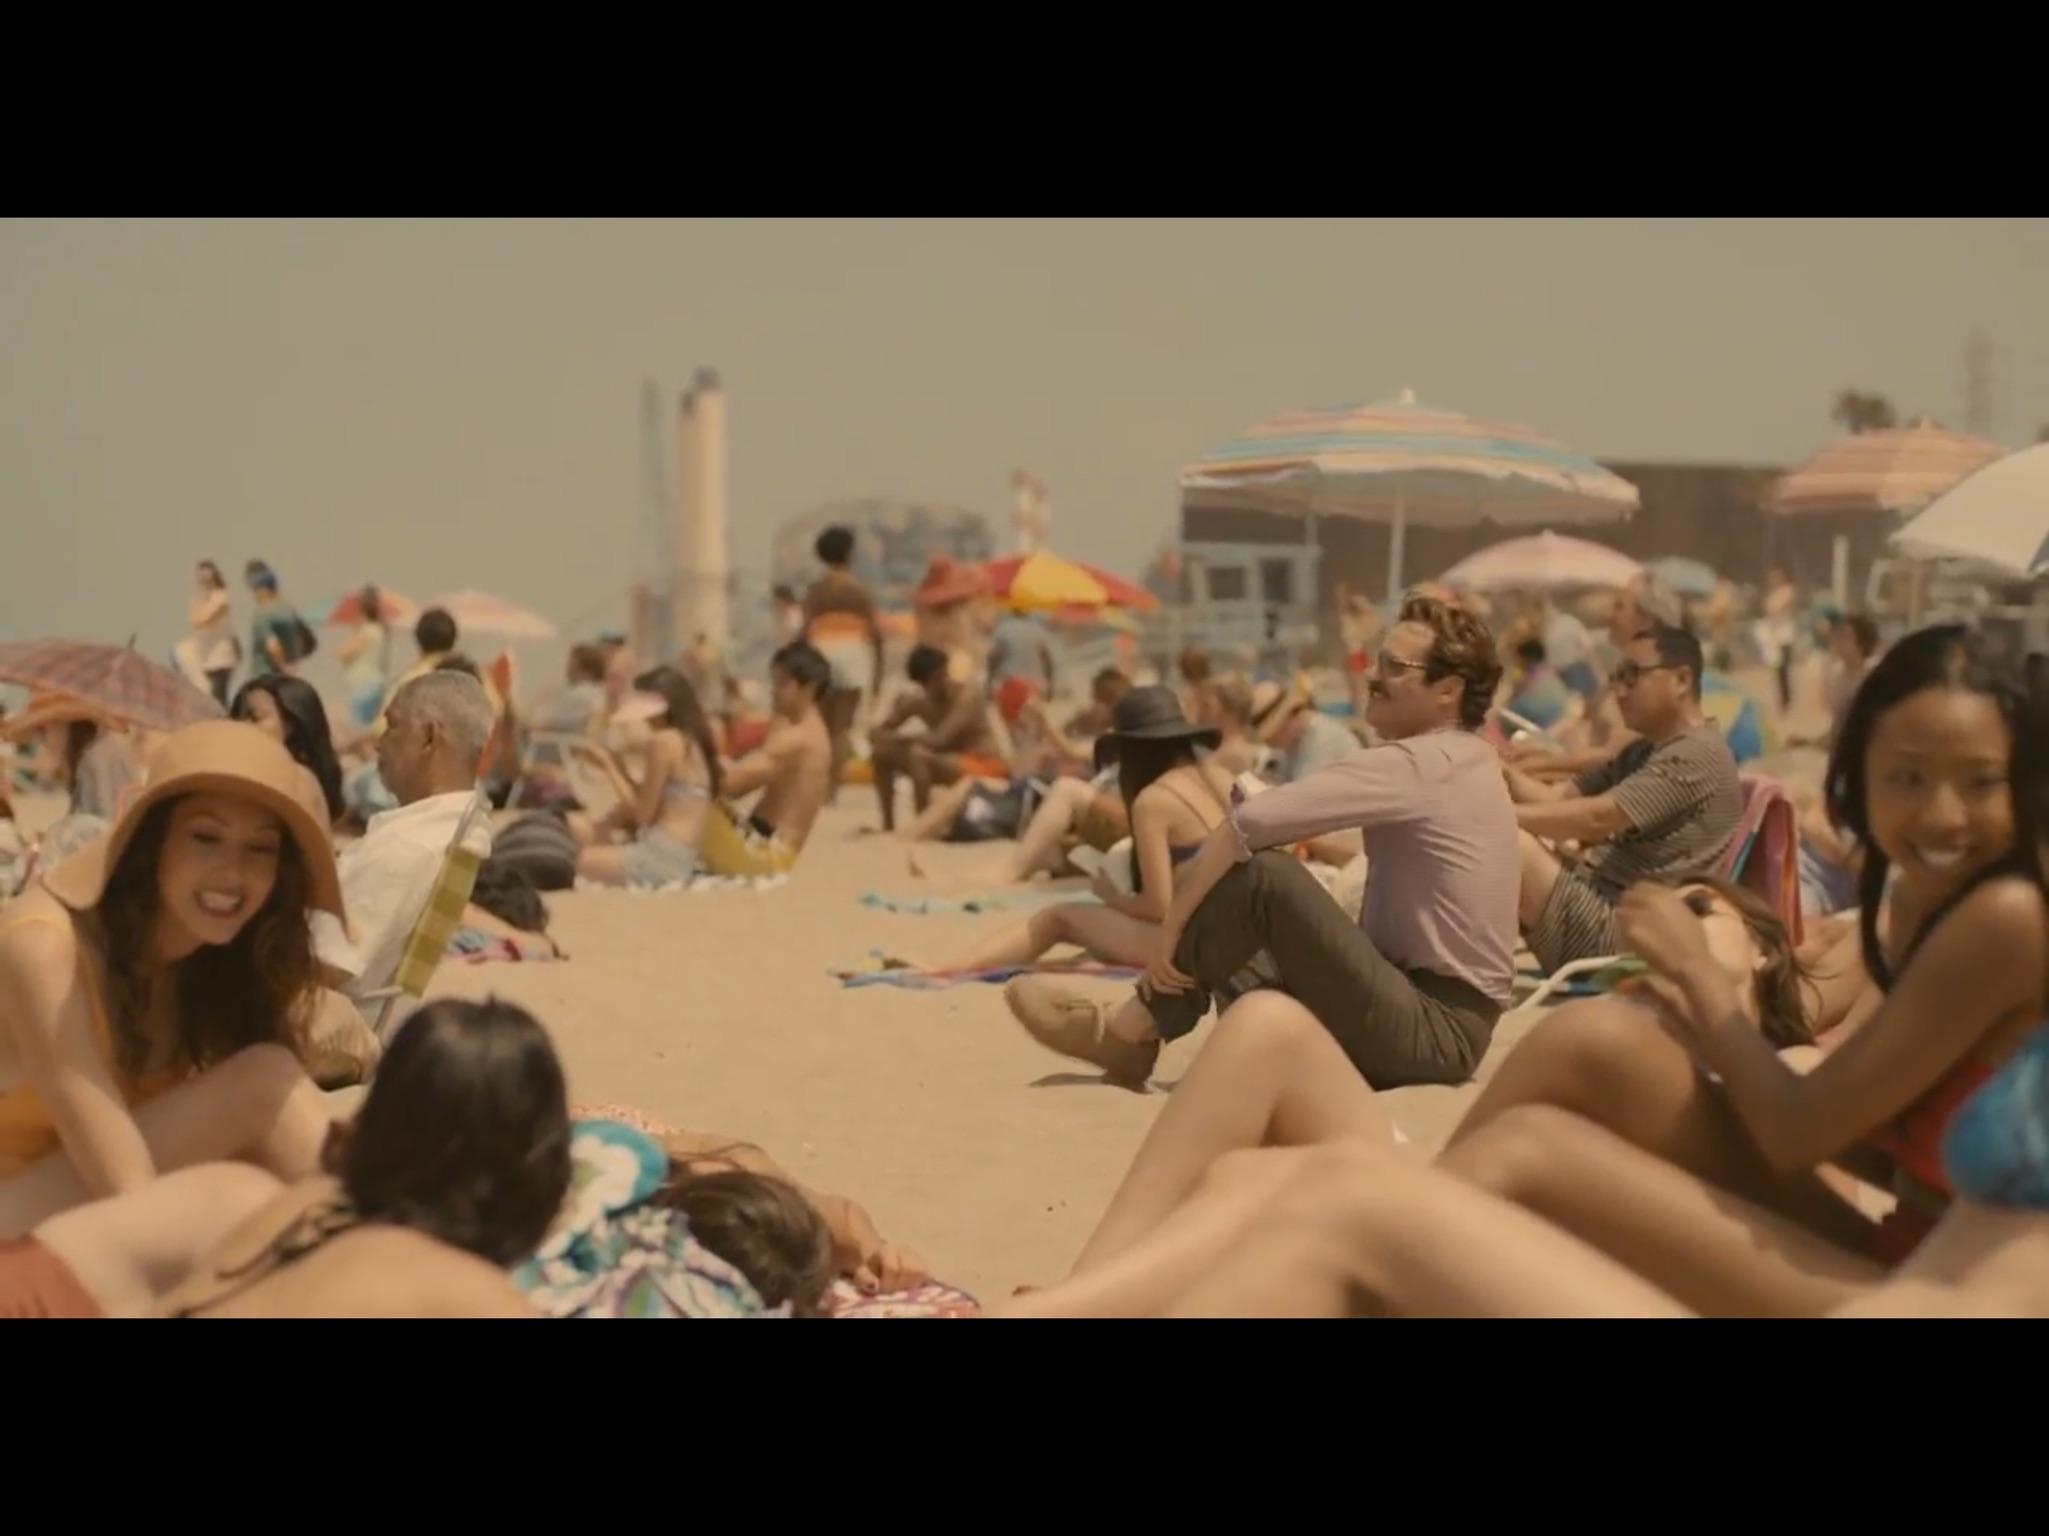 her-movie-2013-screencap-15.JPG